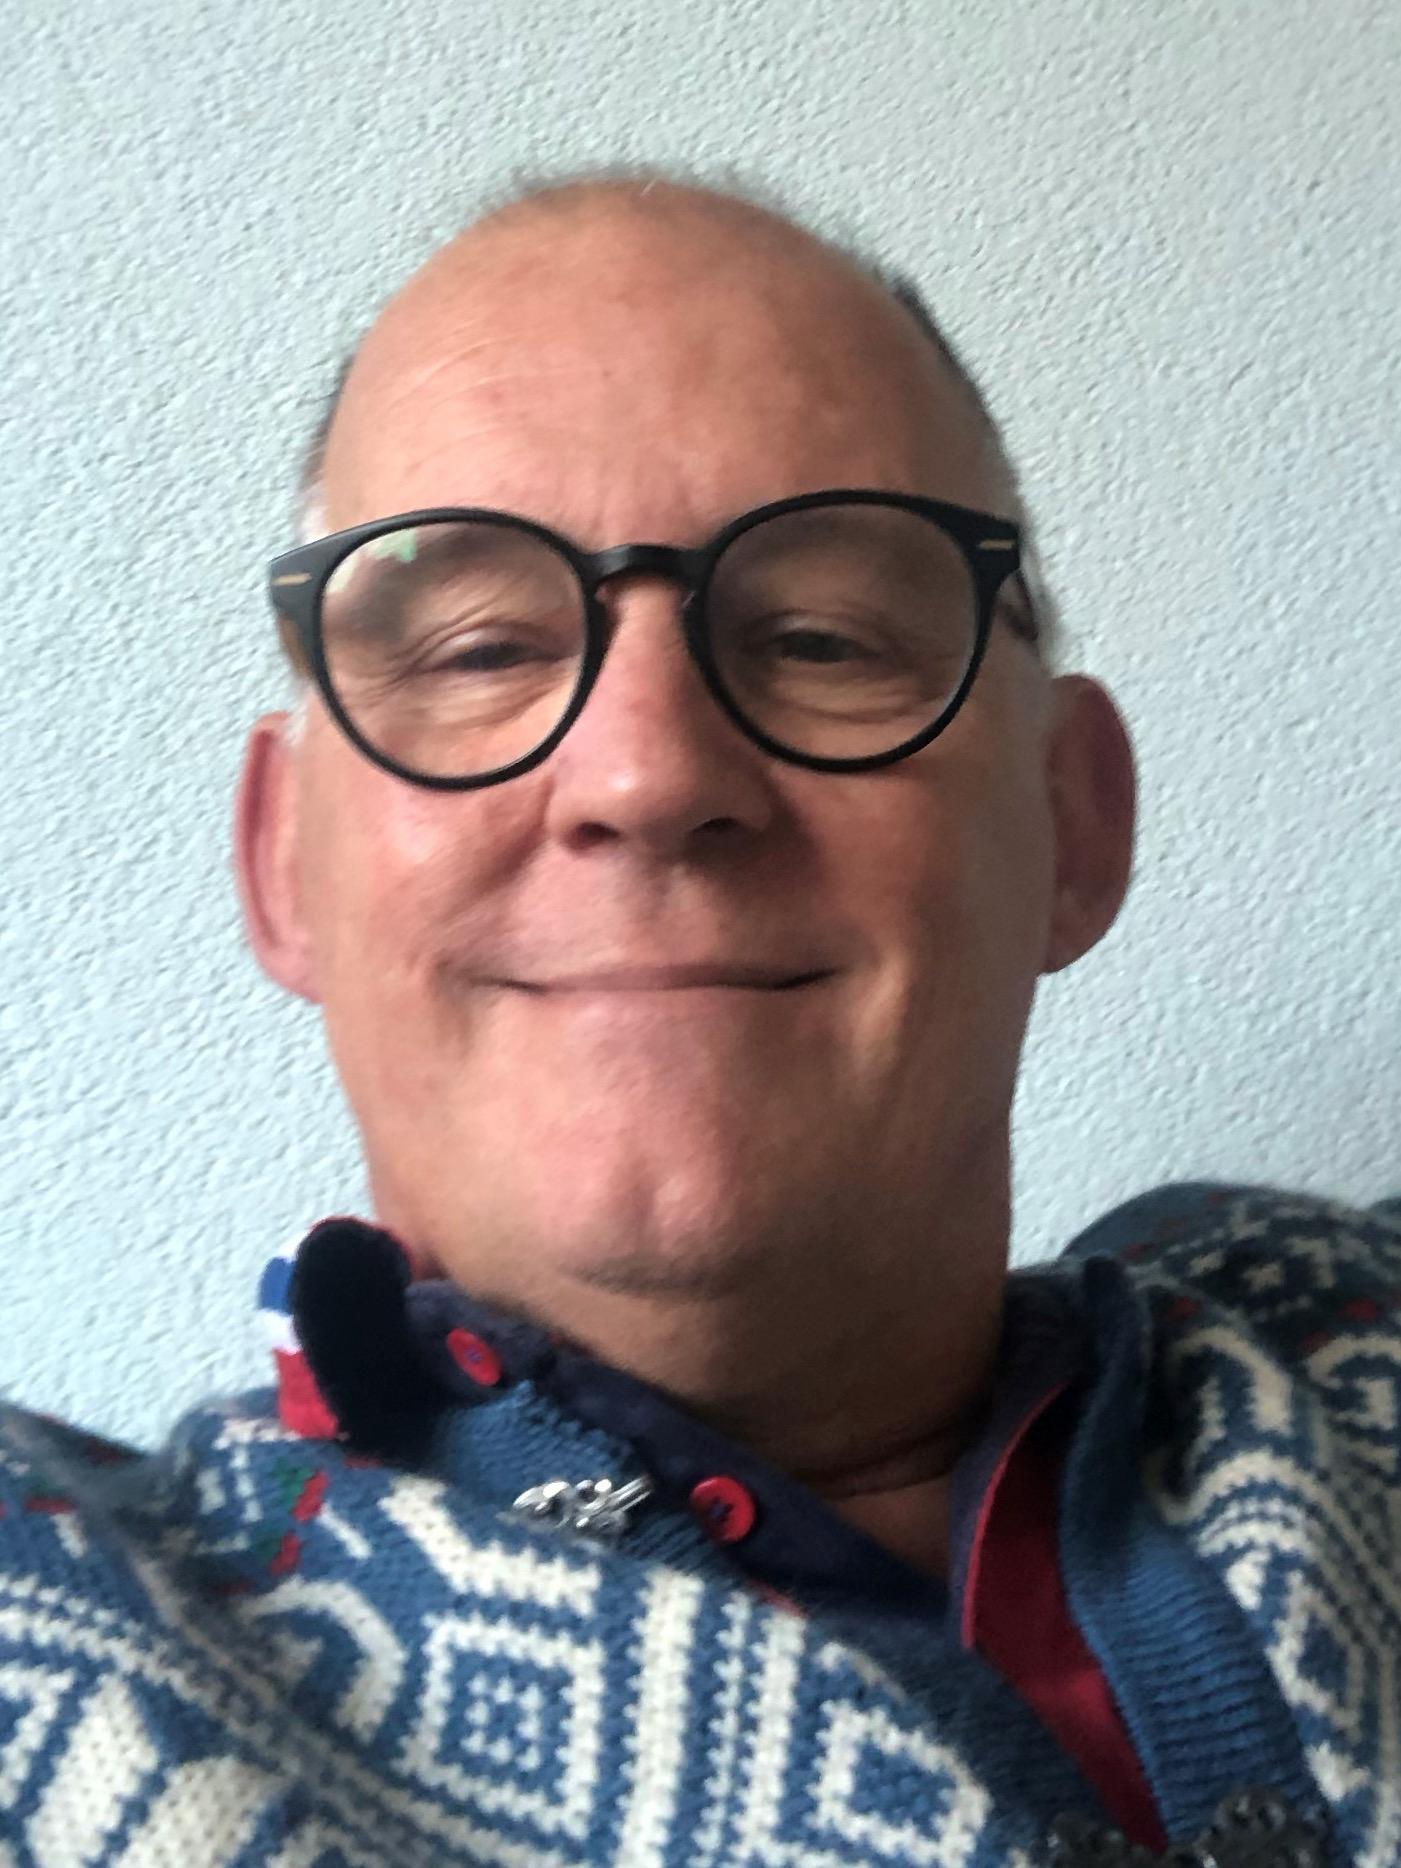 Tony van der Togt